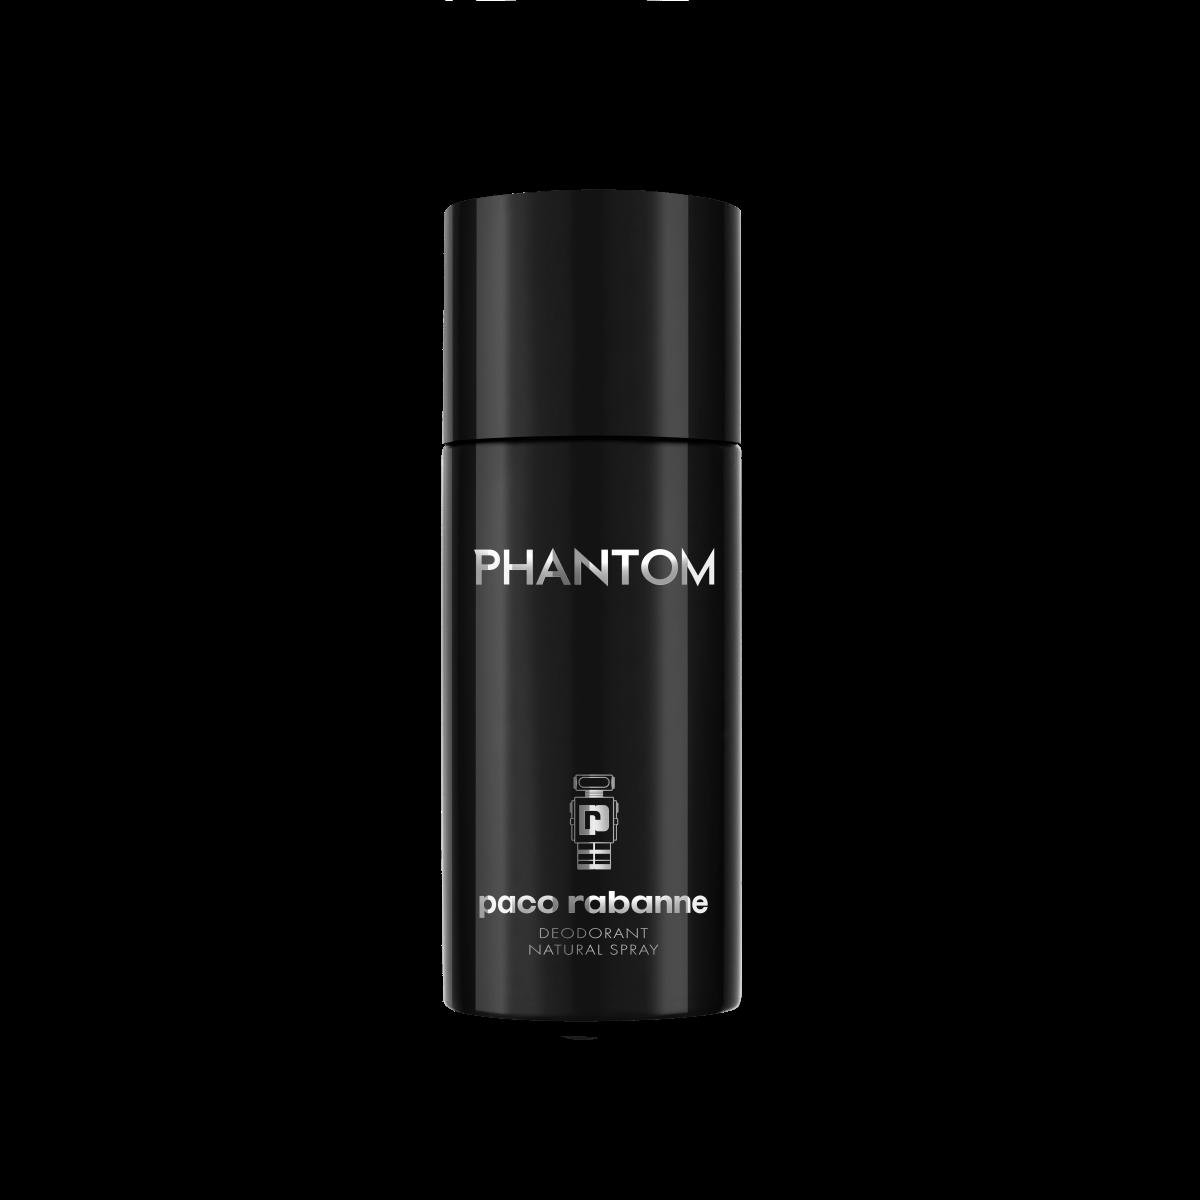 Paco Rabanne Phantom Deodorant Spray - available to order online at vitaltone.co.uk